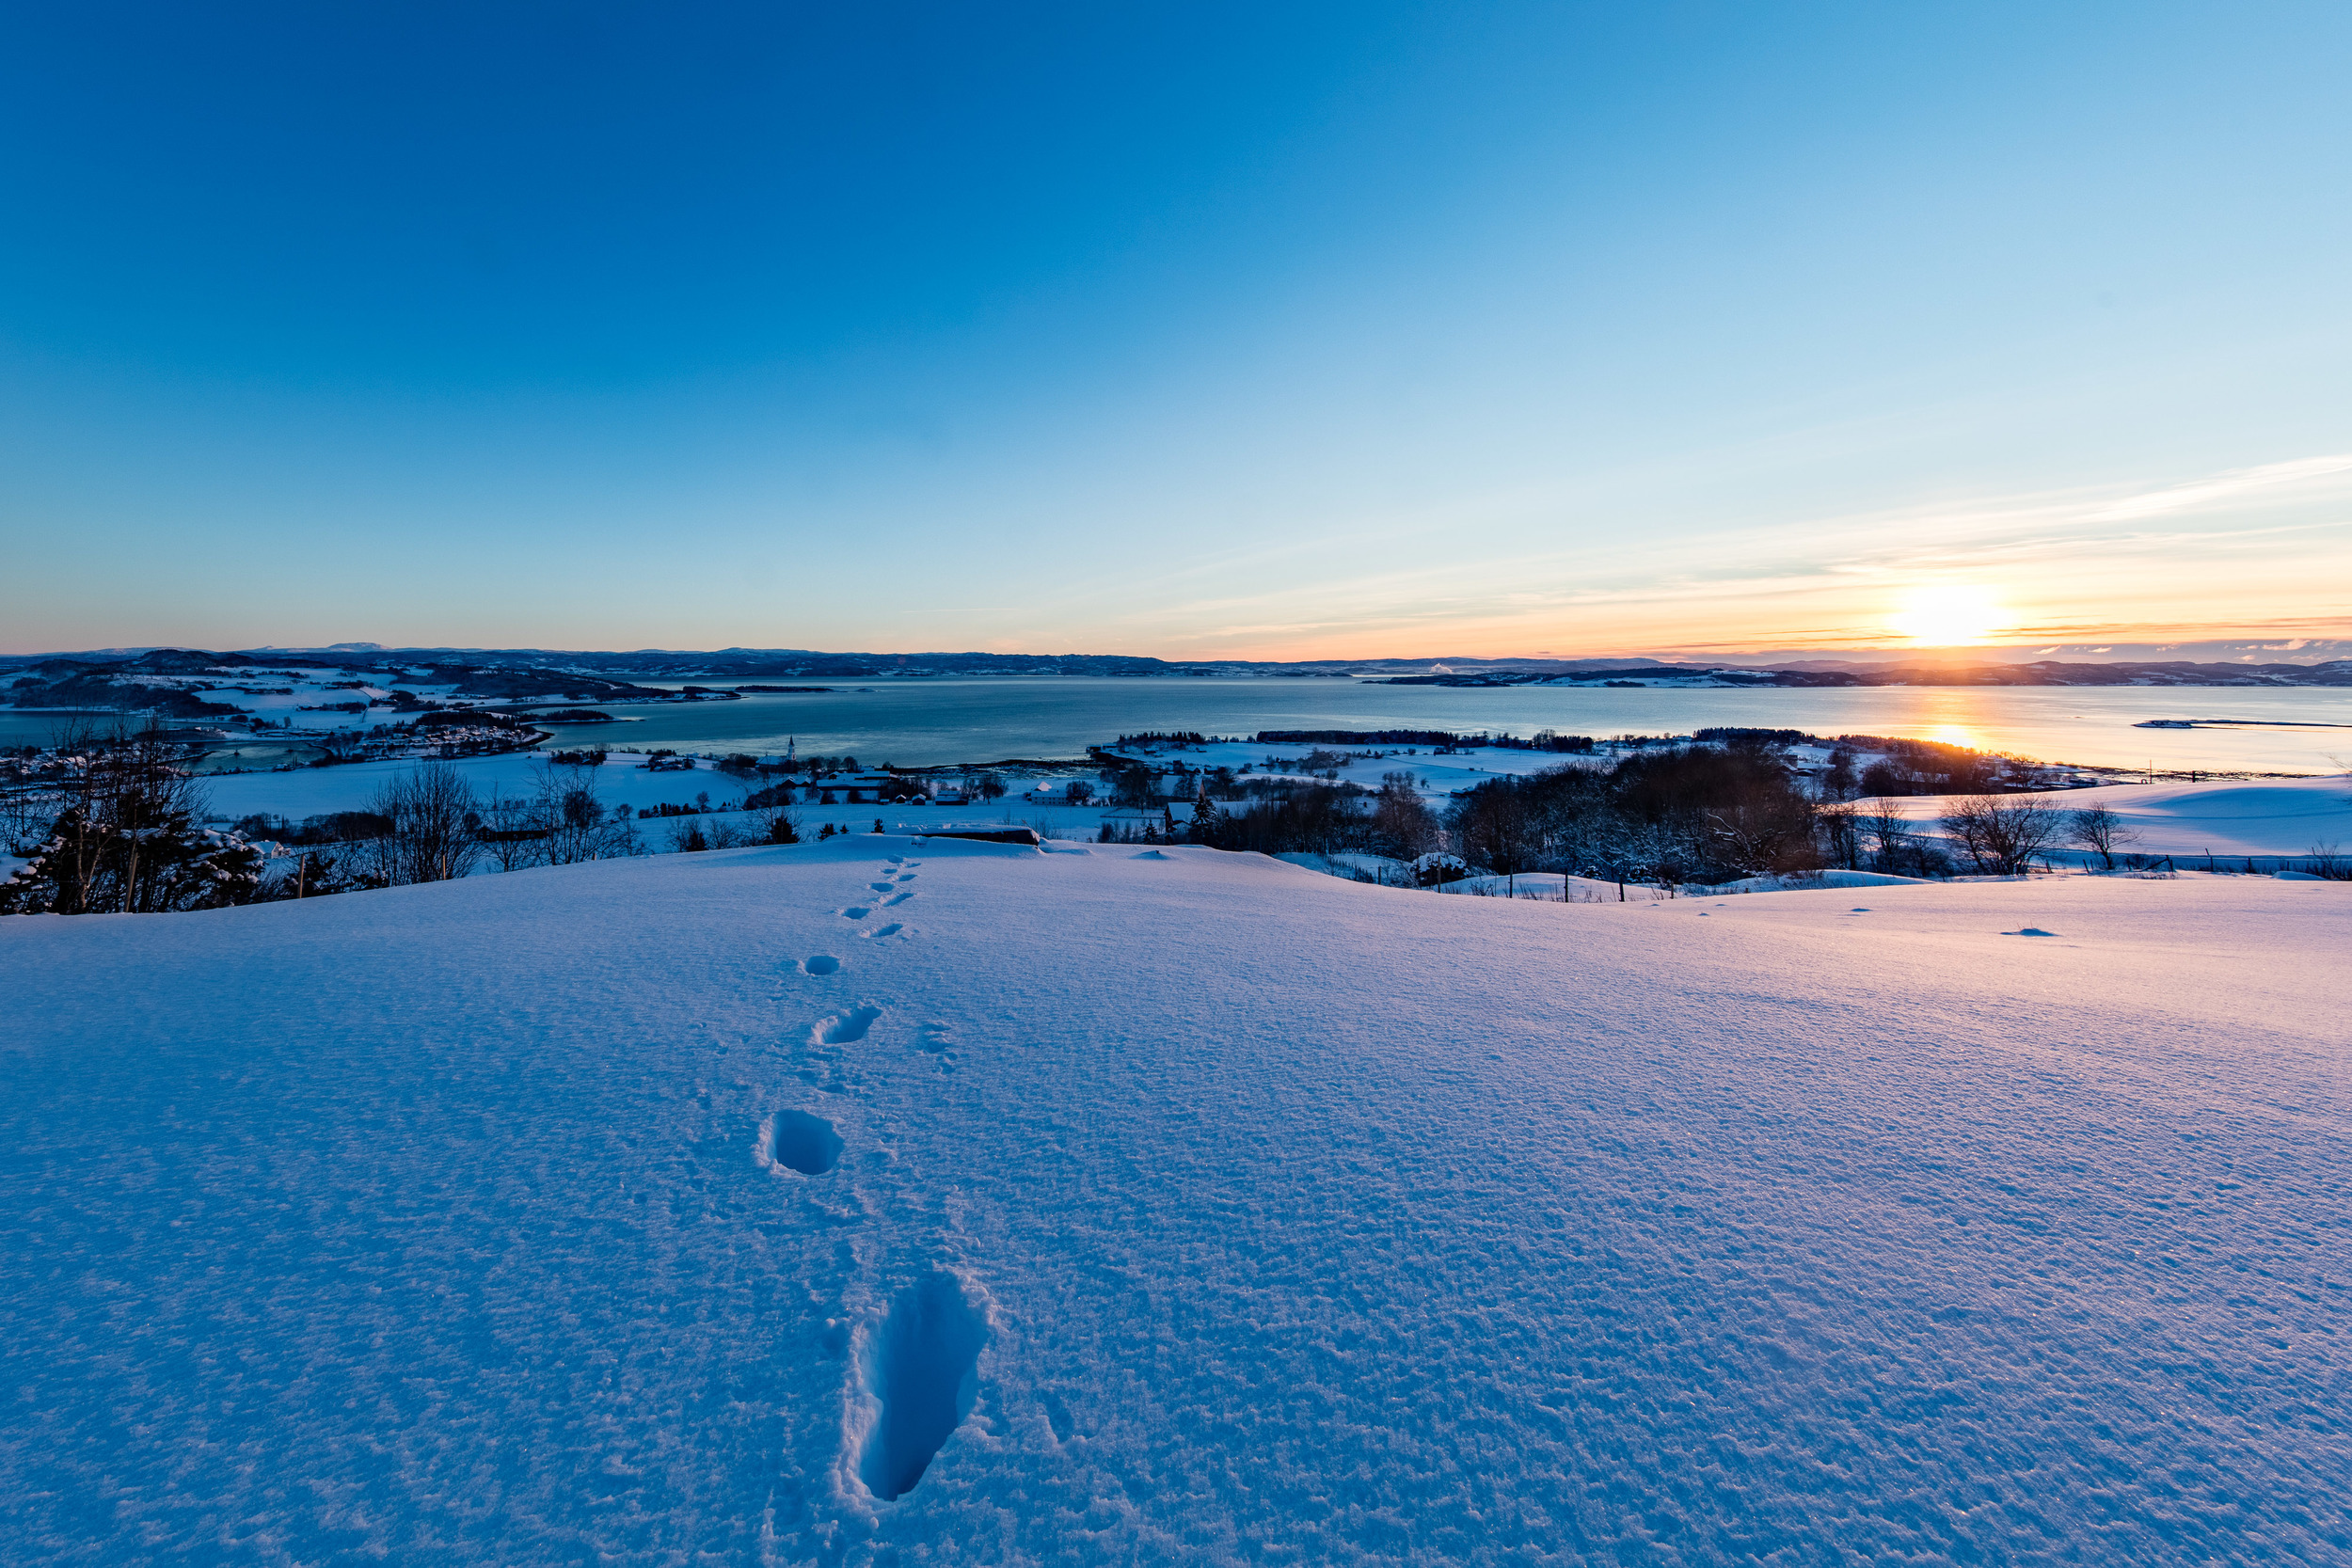 Foto: Sven-Erik Knoff |  www.fotoknoff.no